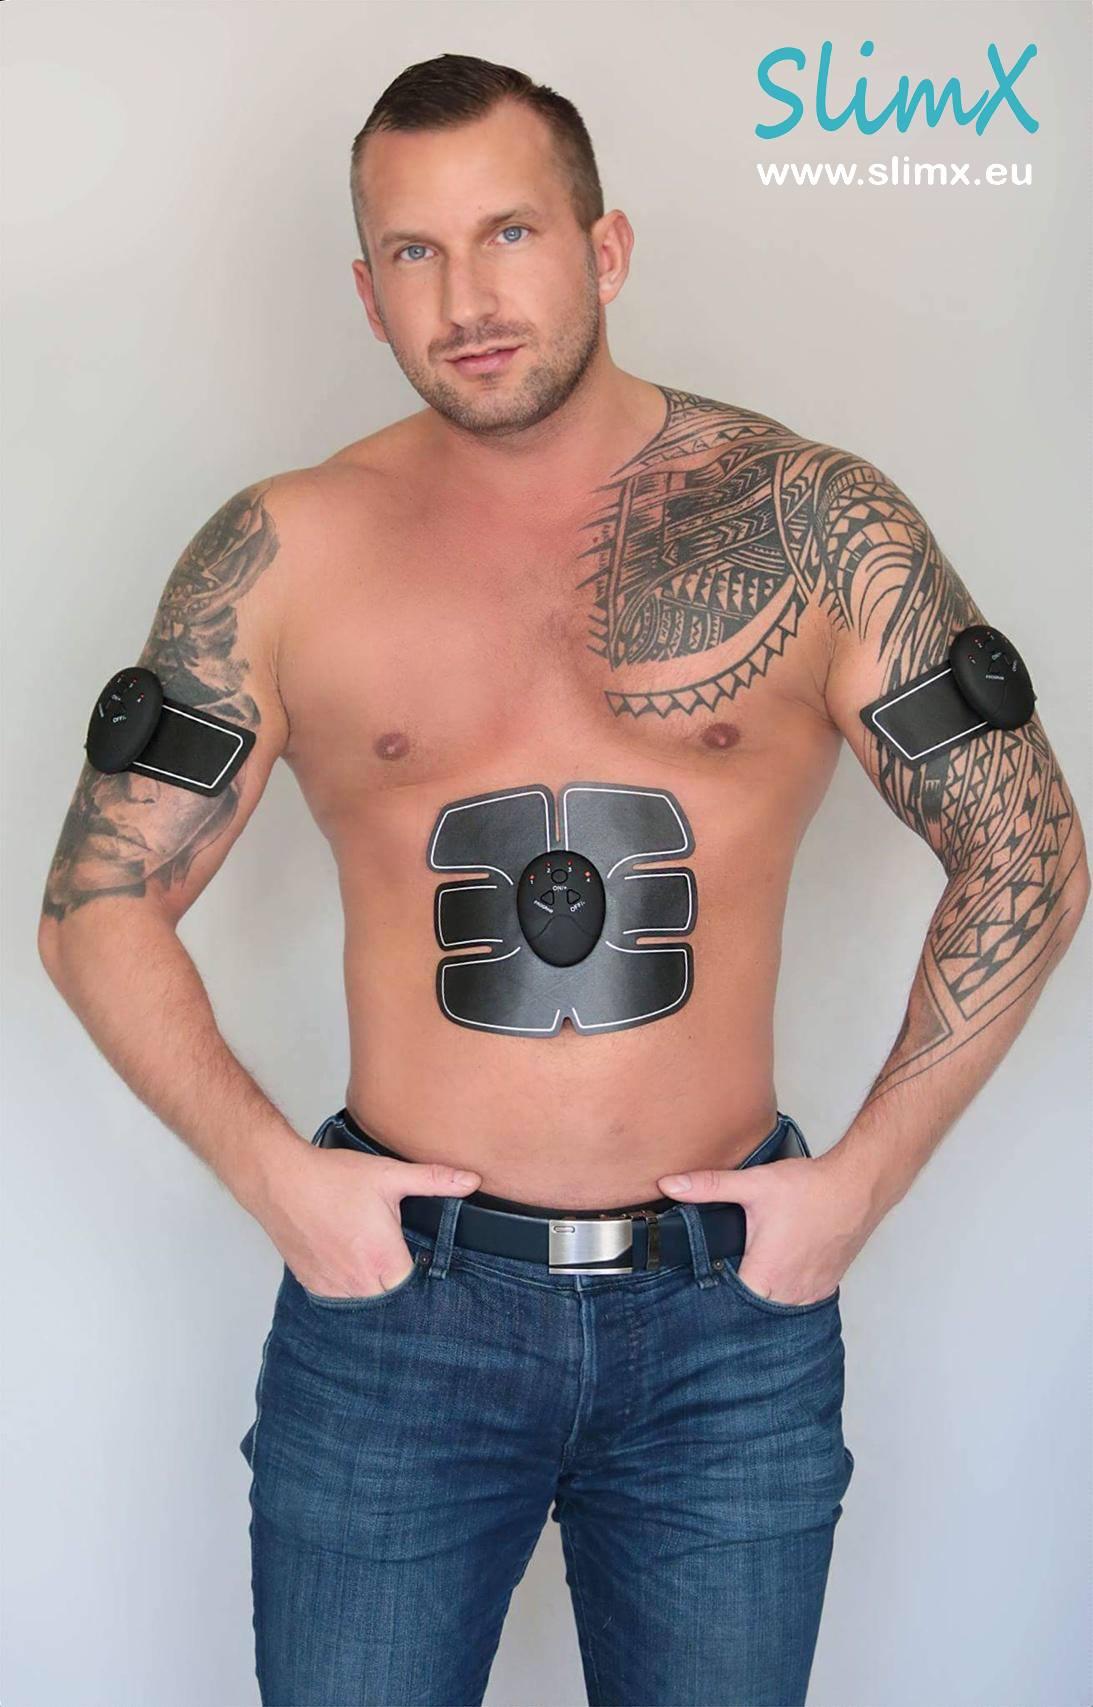 Elktrostymulator mięśni SlimX